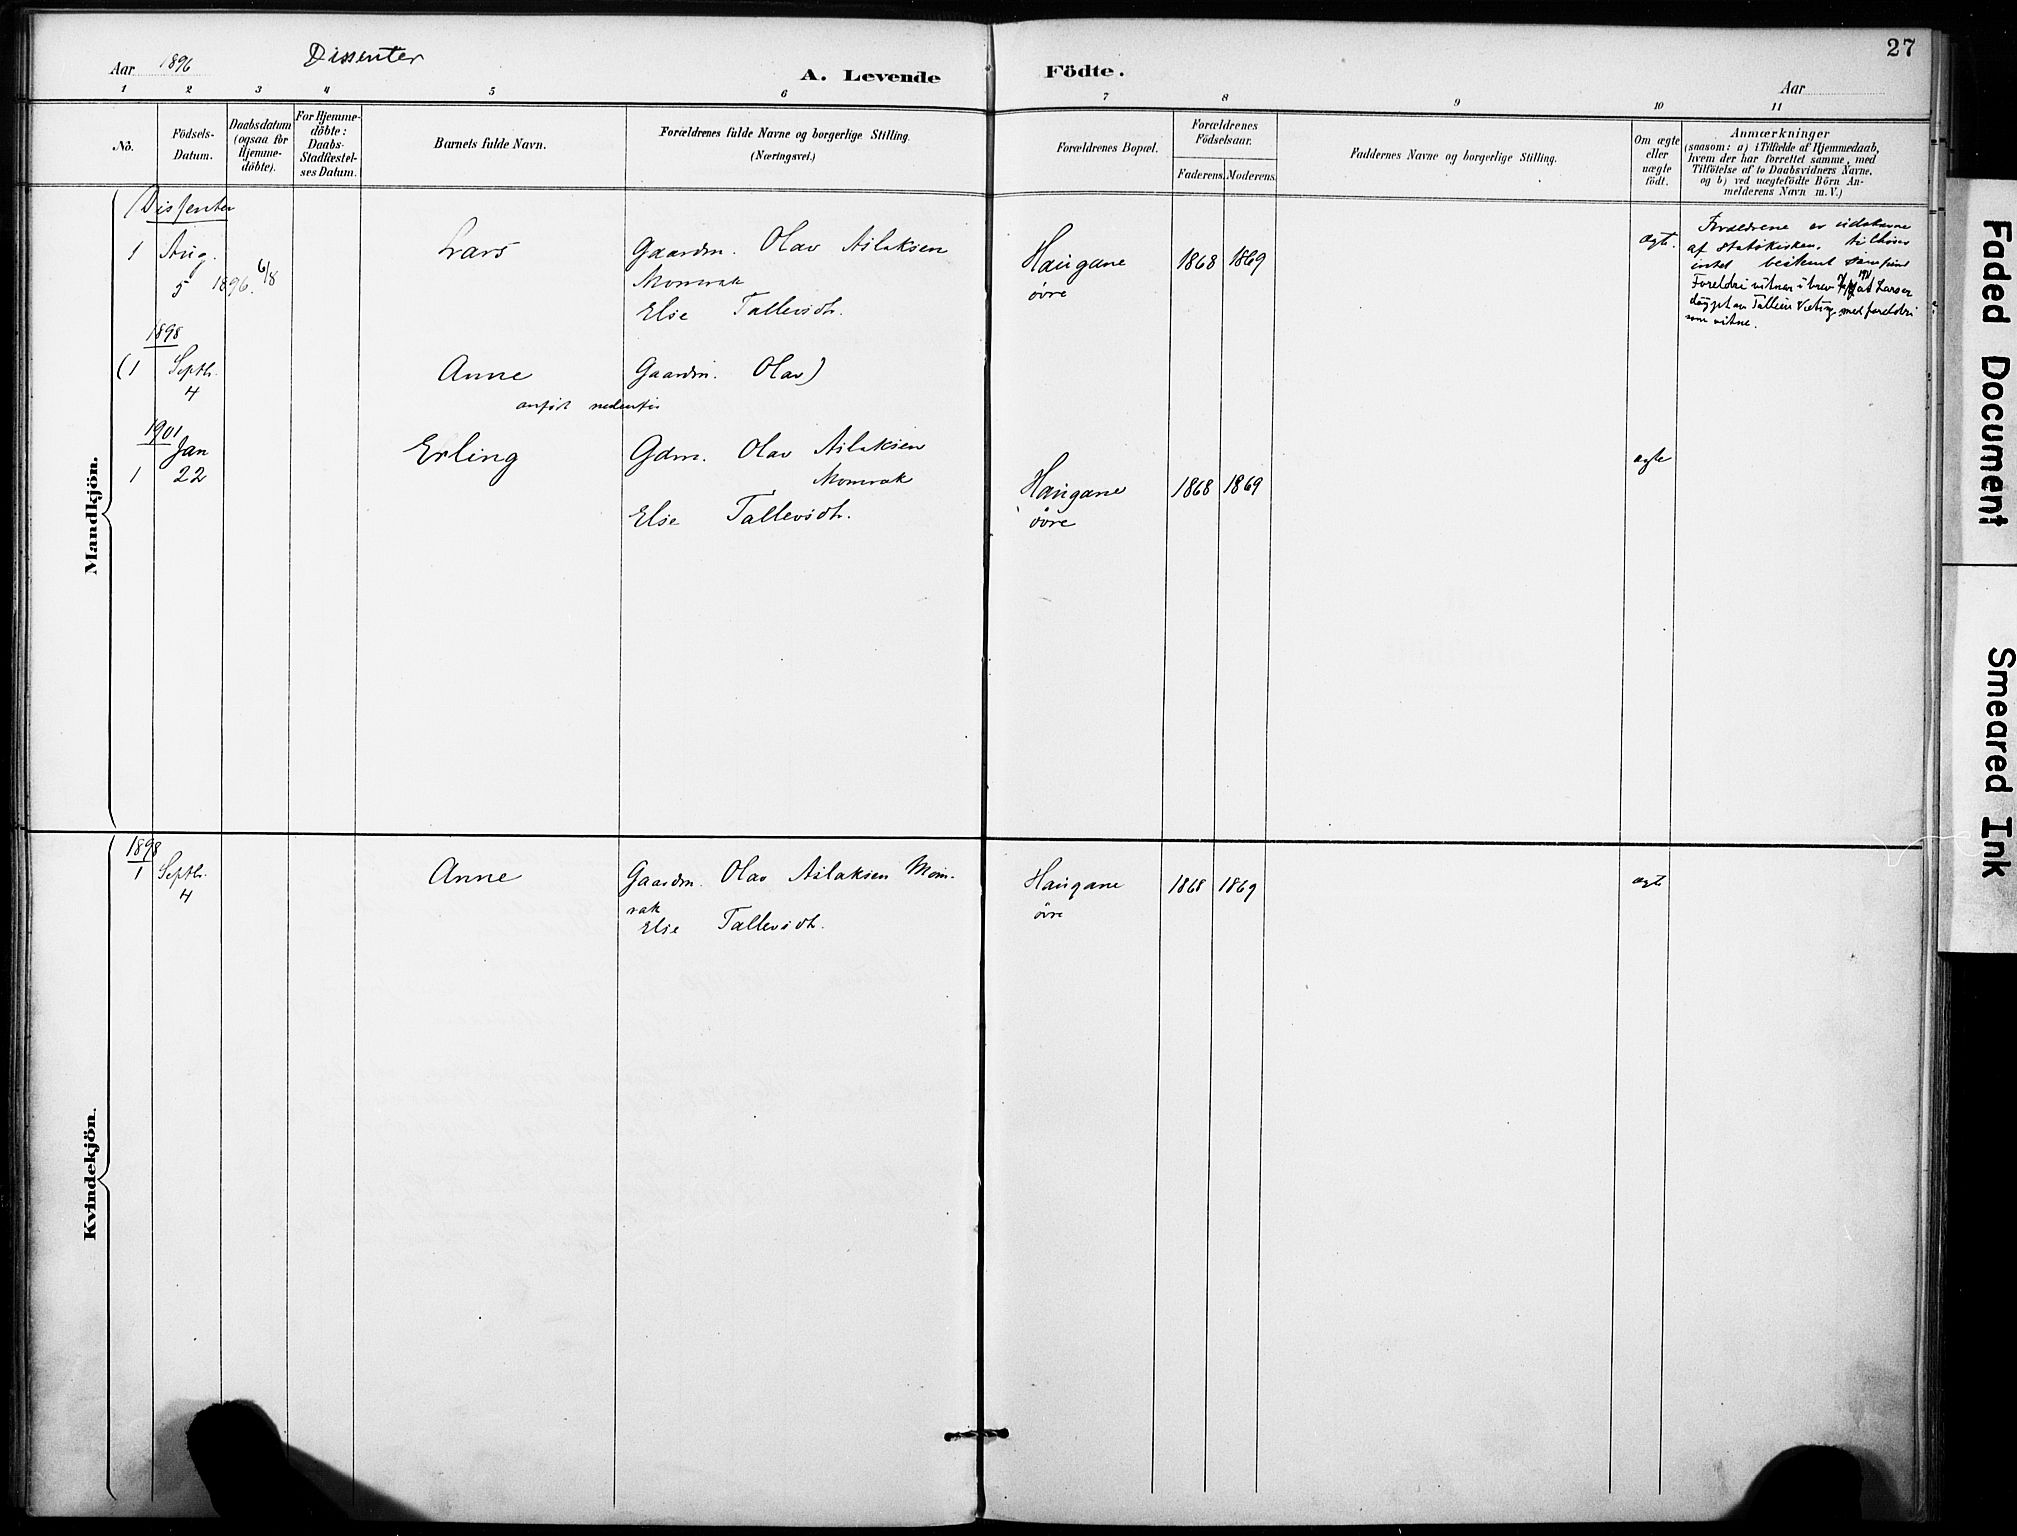 SAKO, Fyresdal kirkebøker, F/Fb/L0003: Ministerialbok nr. II 3, 1887-1903, s. 27